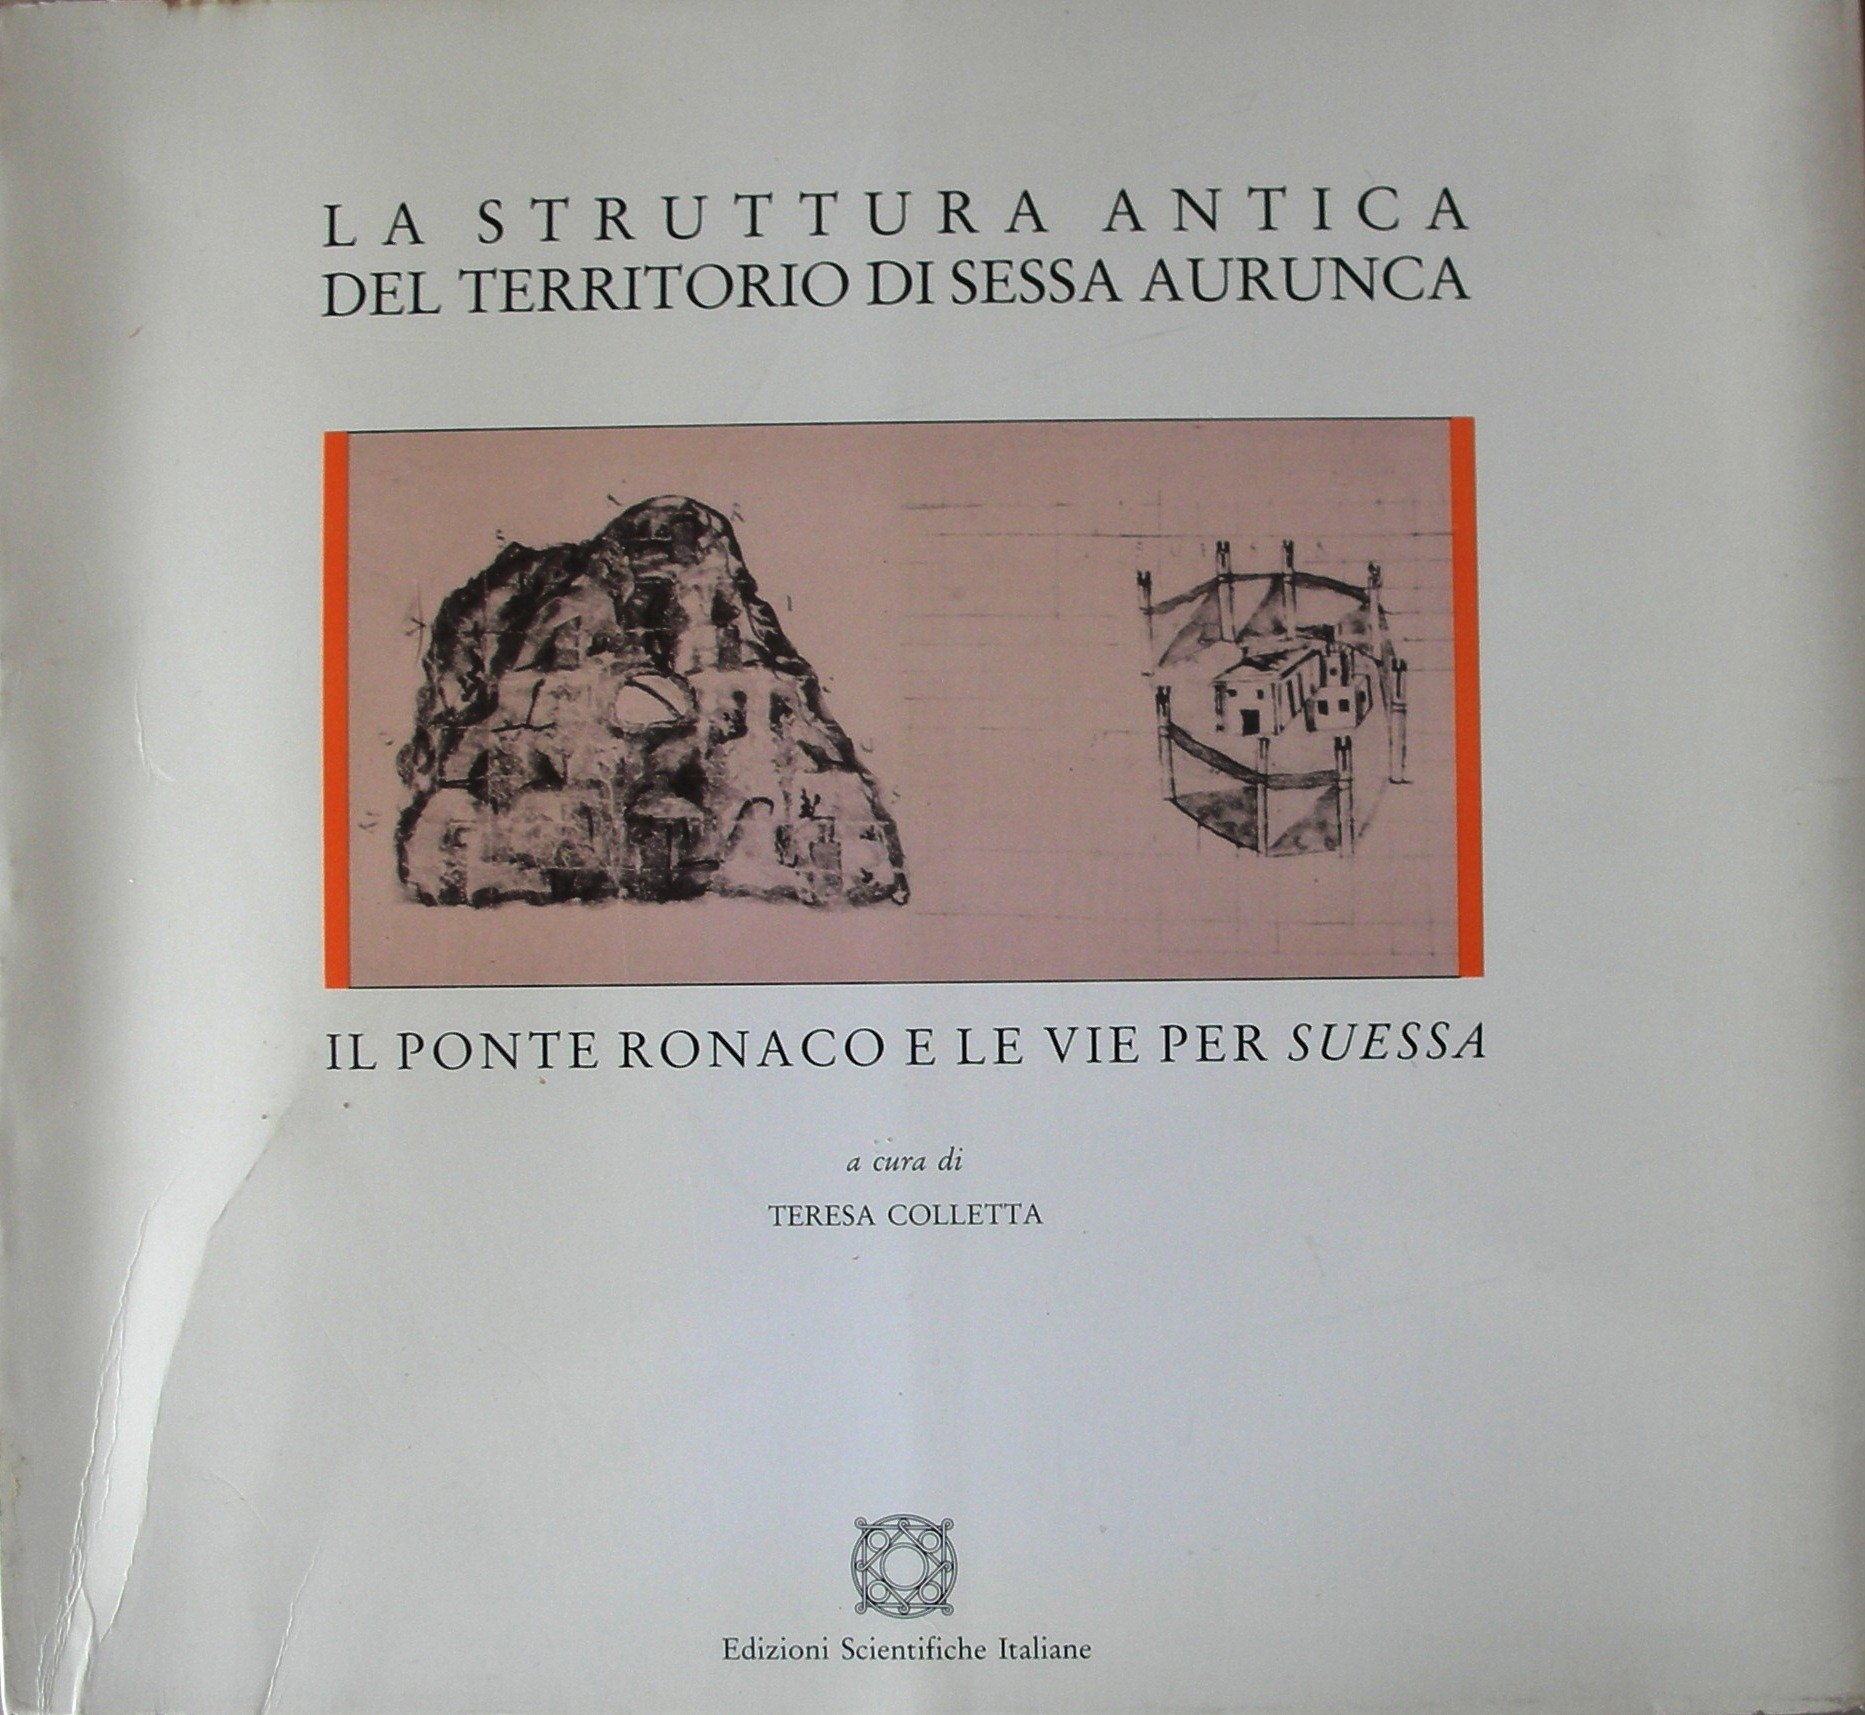 La struttura antica del territorio di Sessa Aurunca